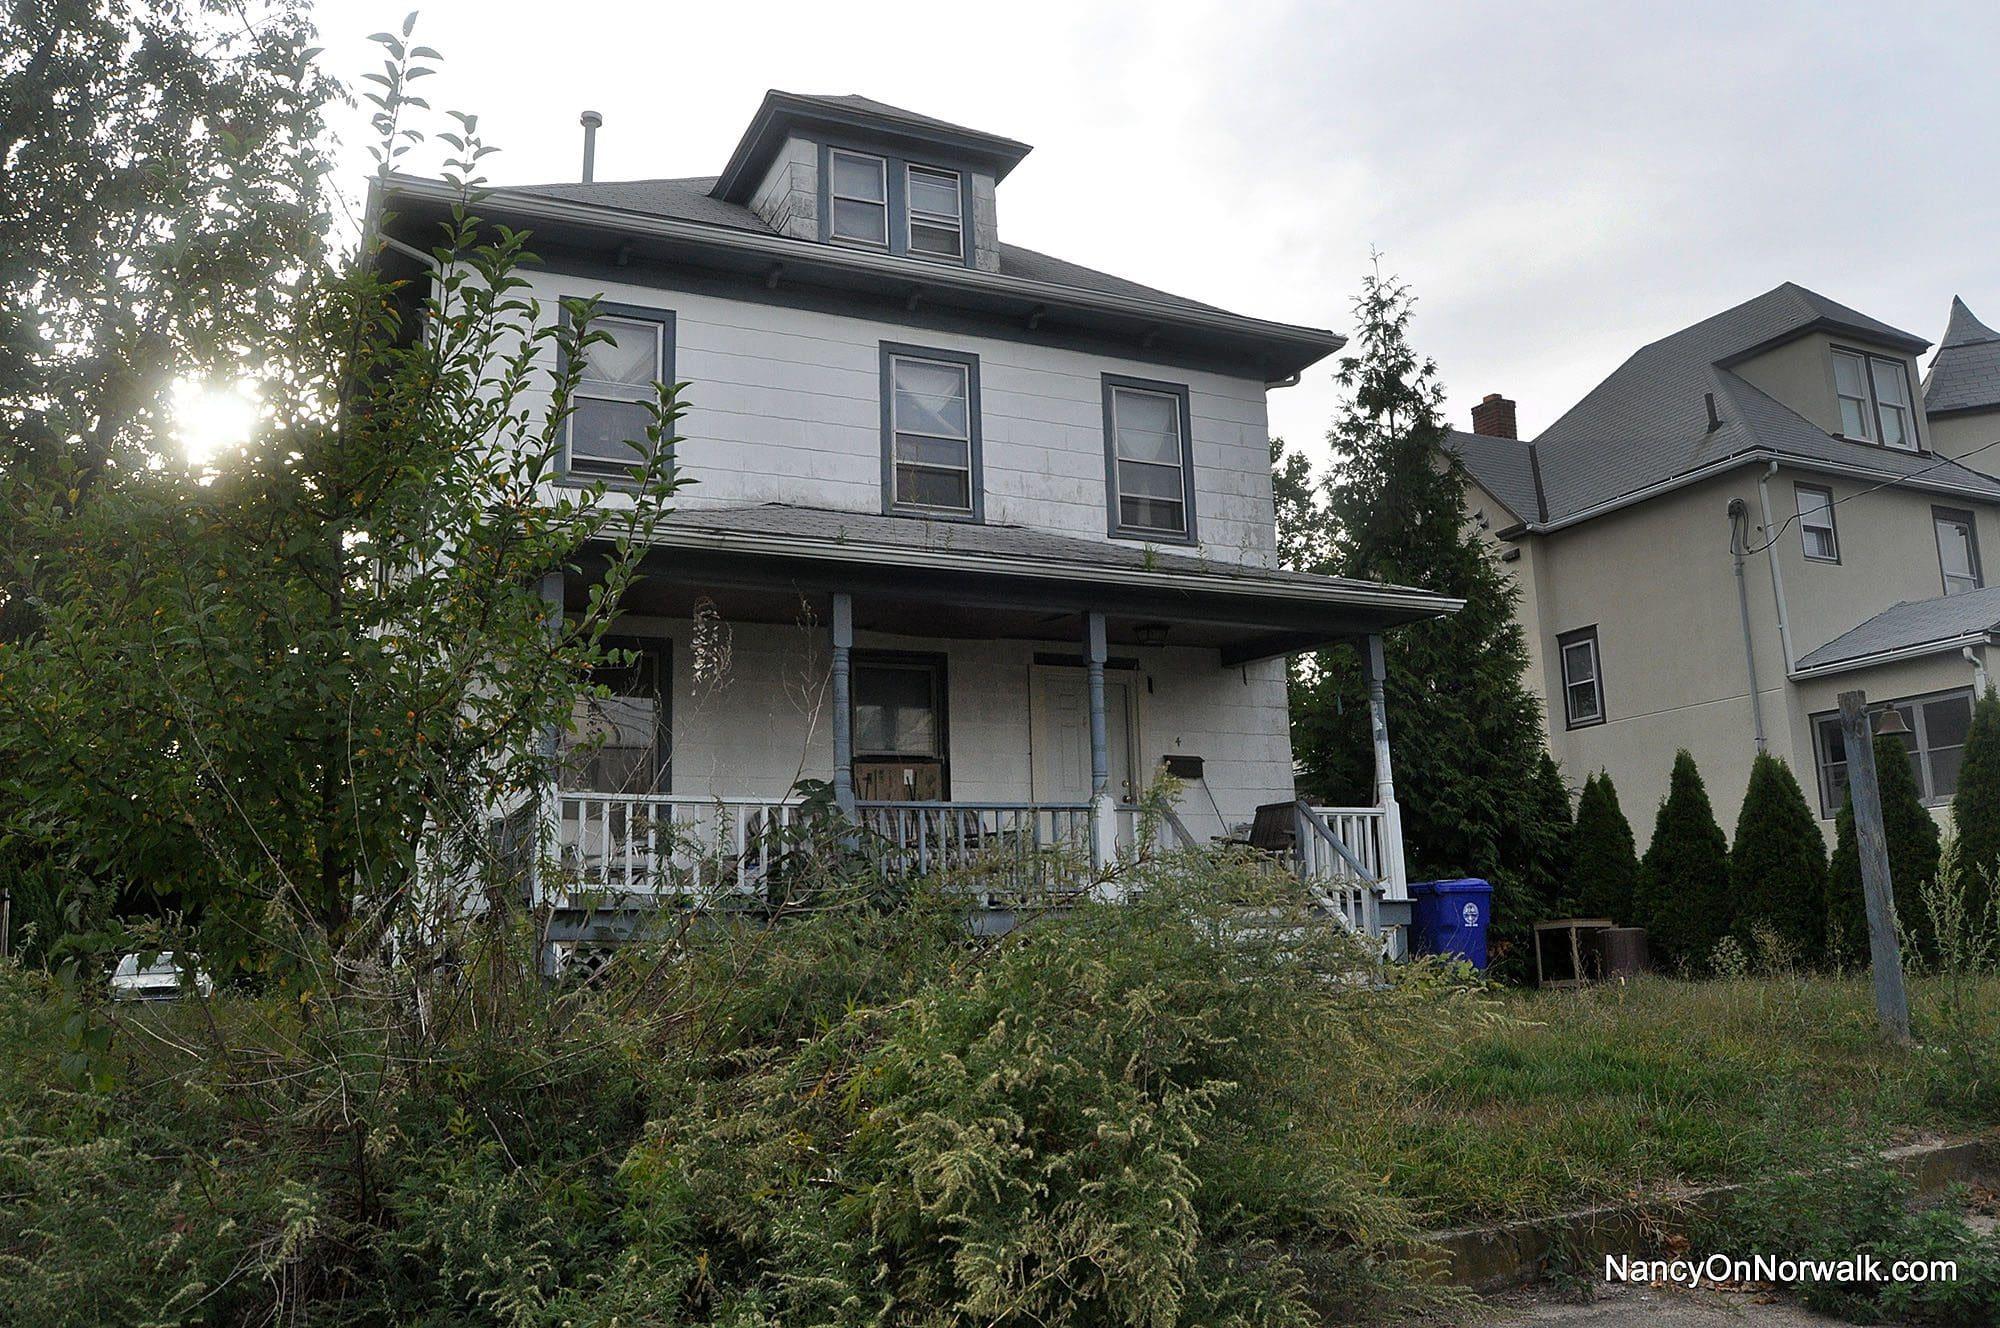 Norwalk Property Tax